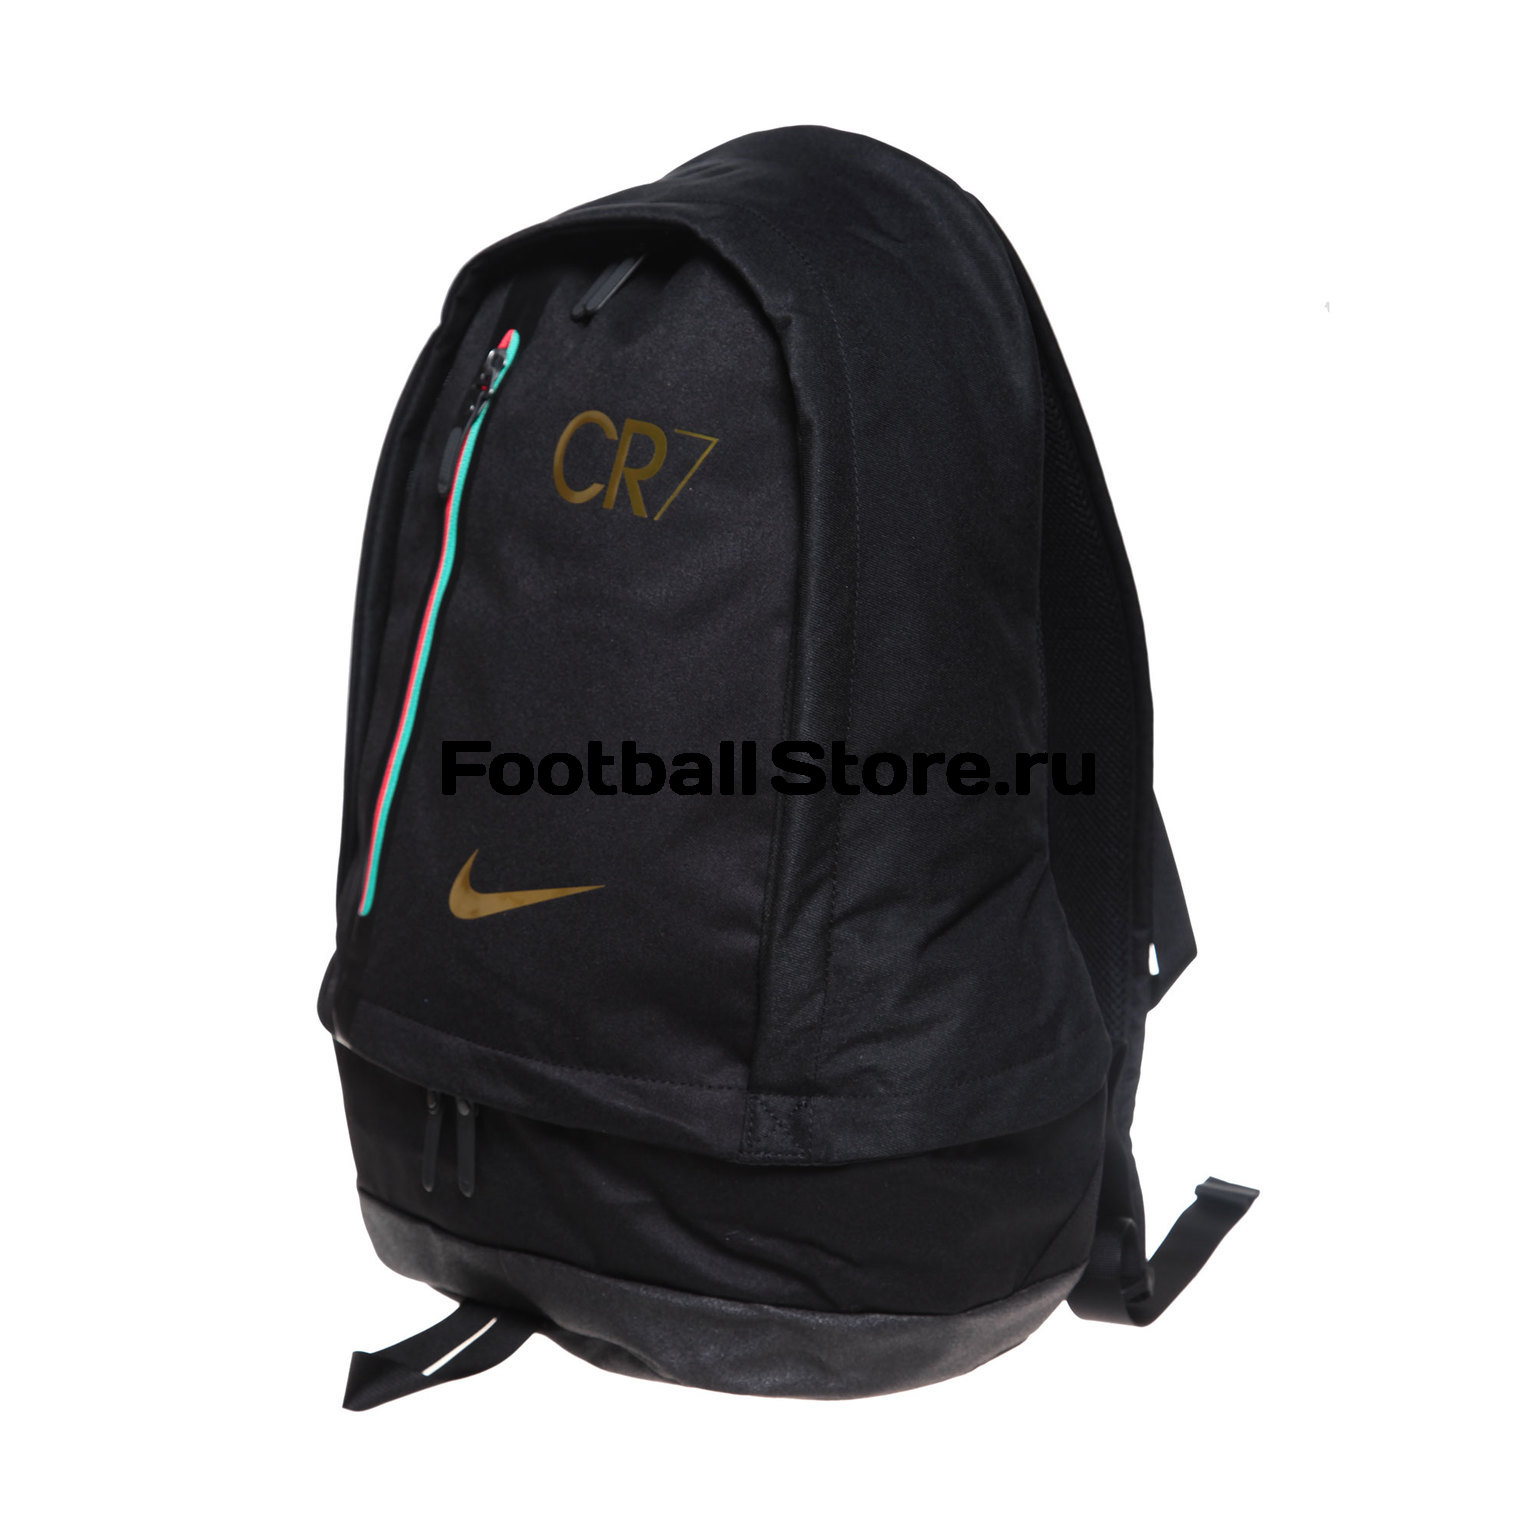 Рюкзак Nike CR7 BA5278-013 рюкзак nike nike ni464bkeud34